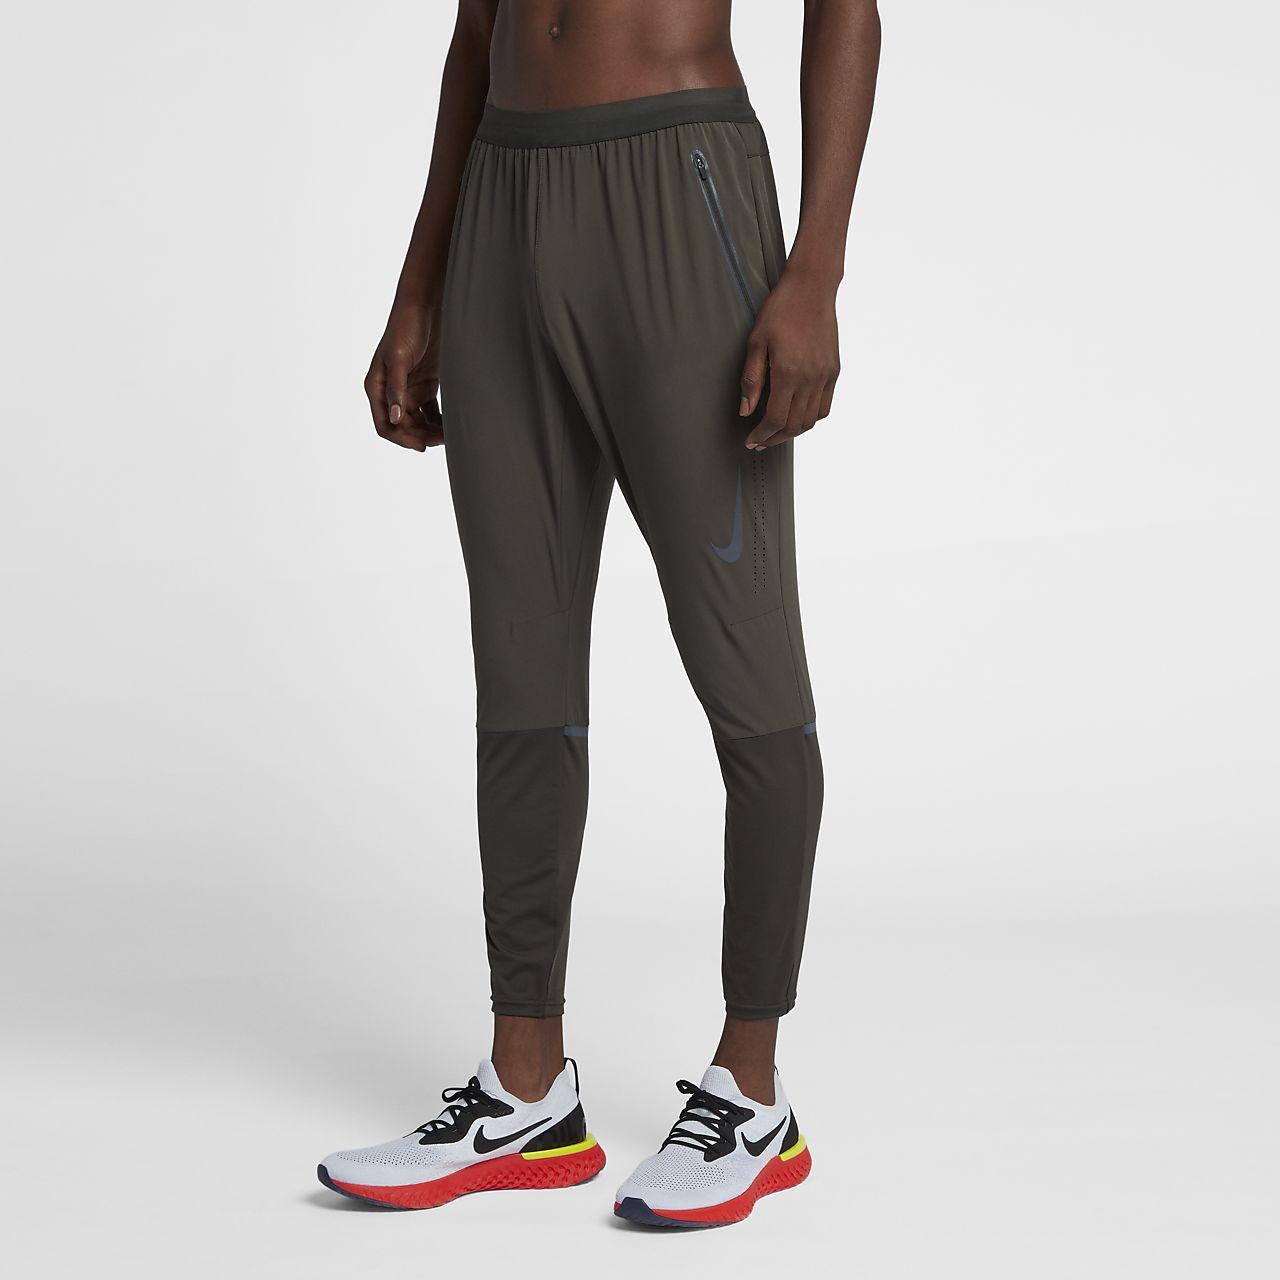 30ae074b171e Nike Swift Men s Running Trousers. Nike.com GB